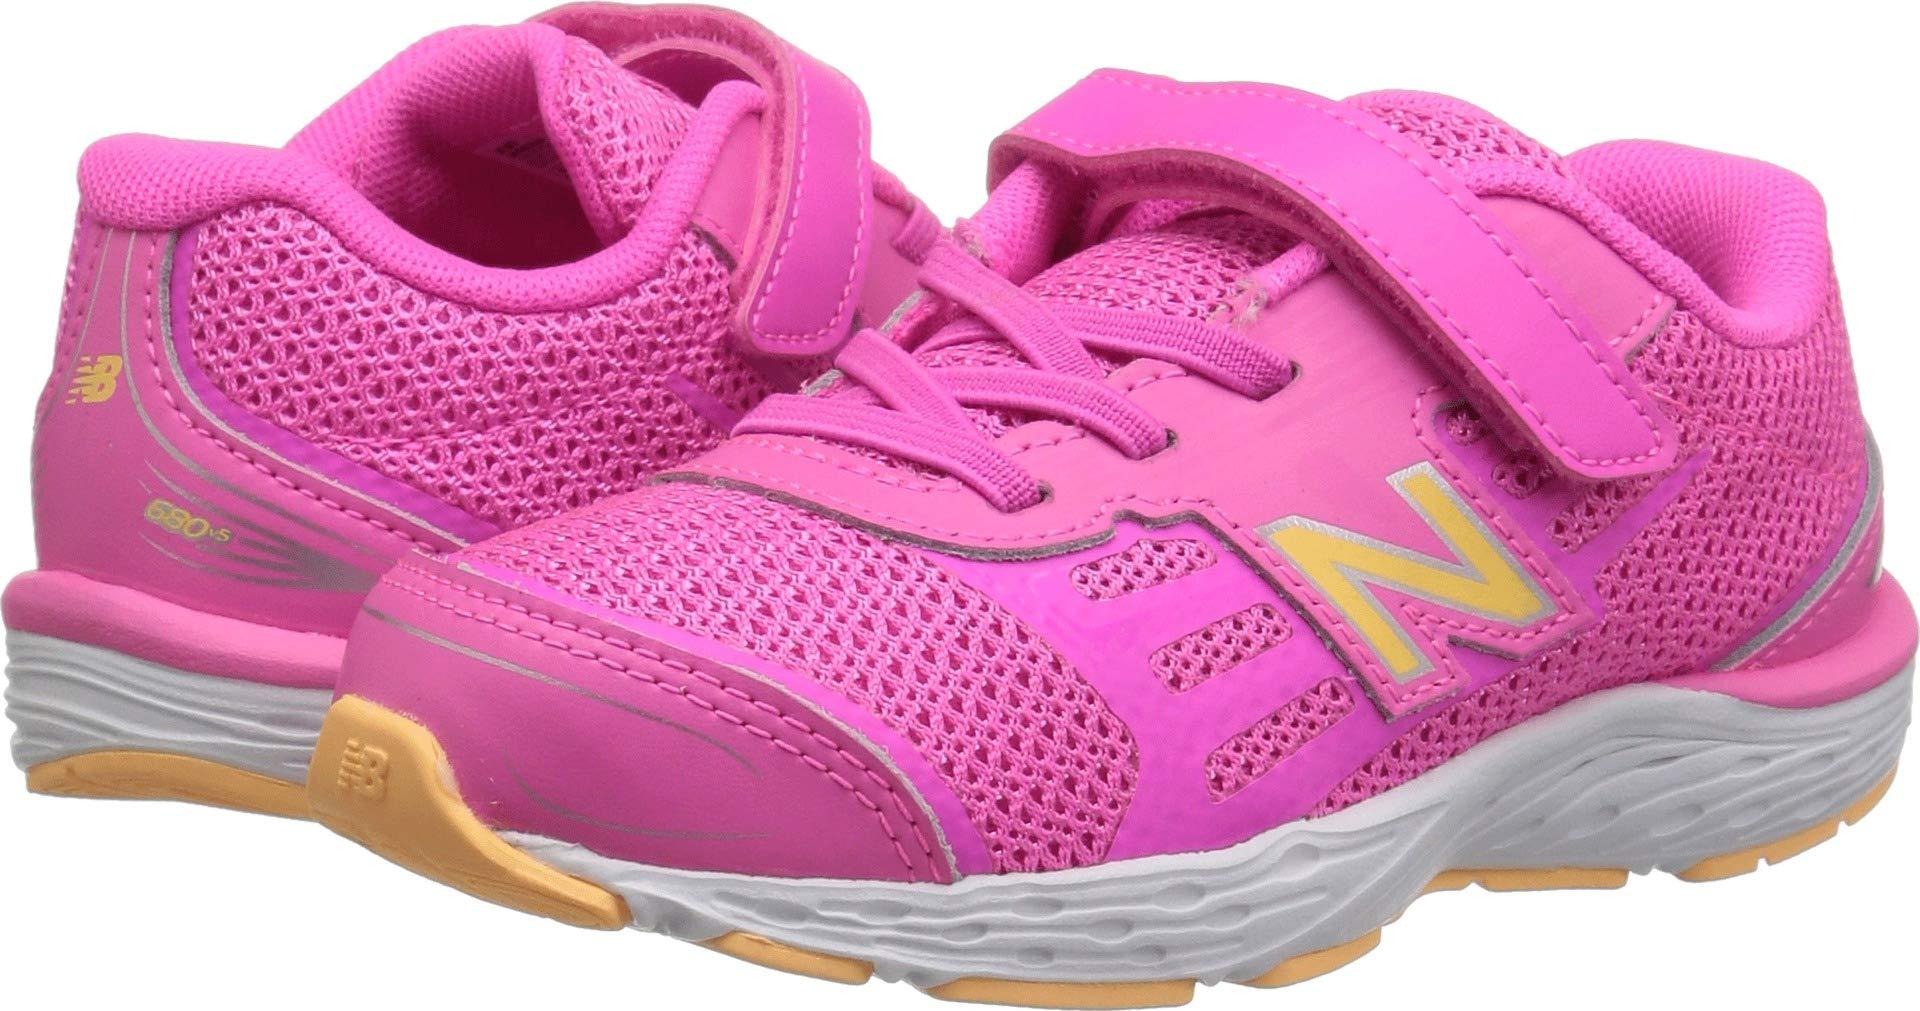 New Balance Girls' 680v5 Hook and Loop Running Shoe, Light Peony/Light Mango, 13.5 W US Little Kid